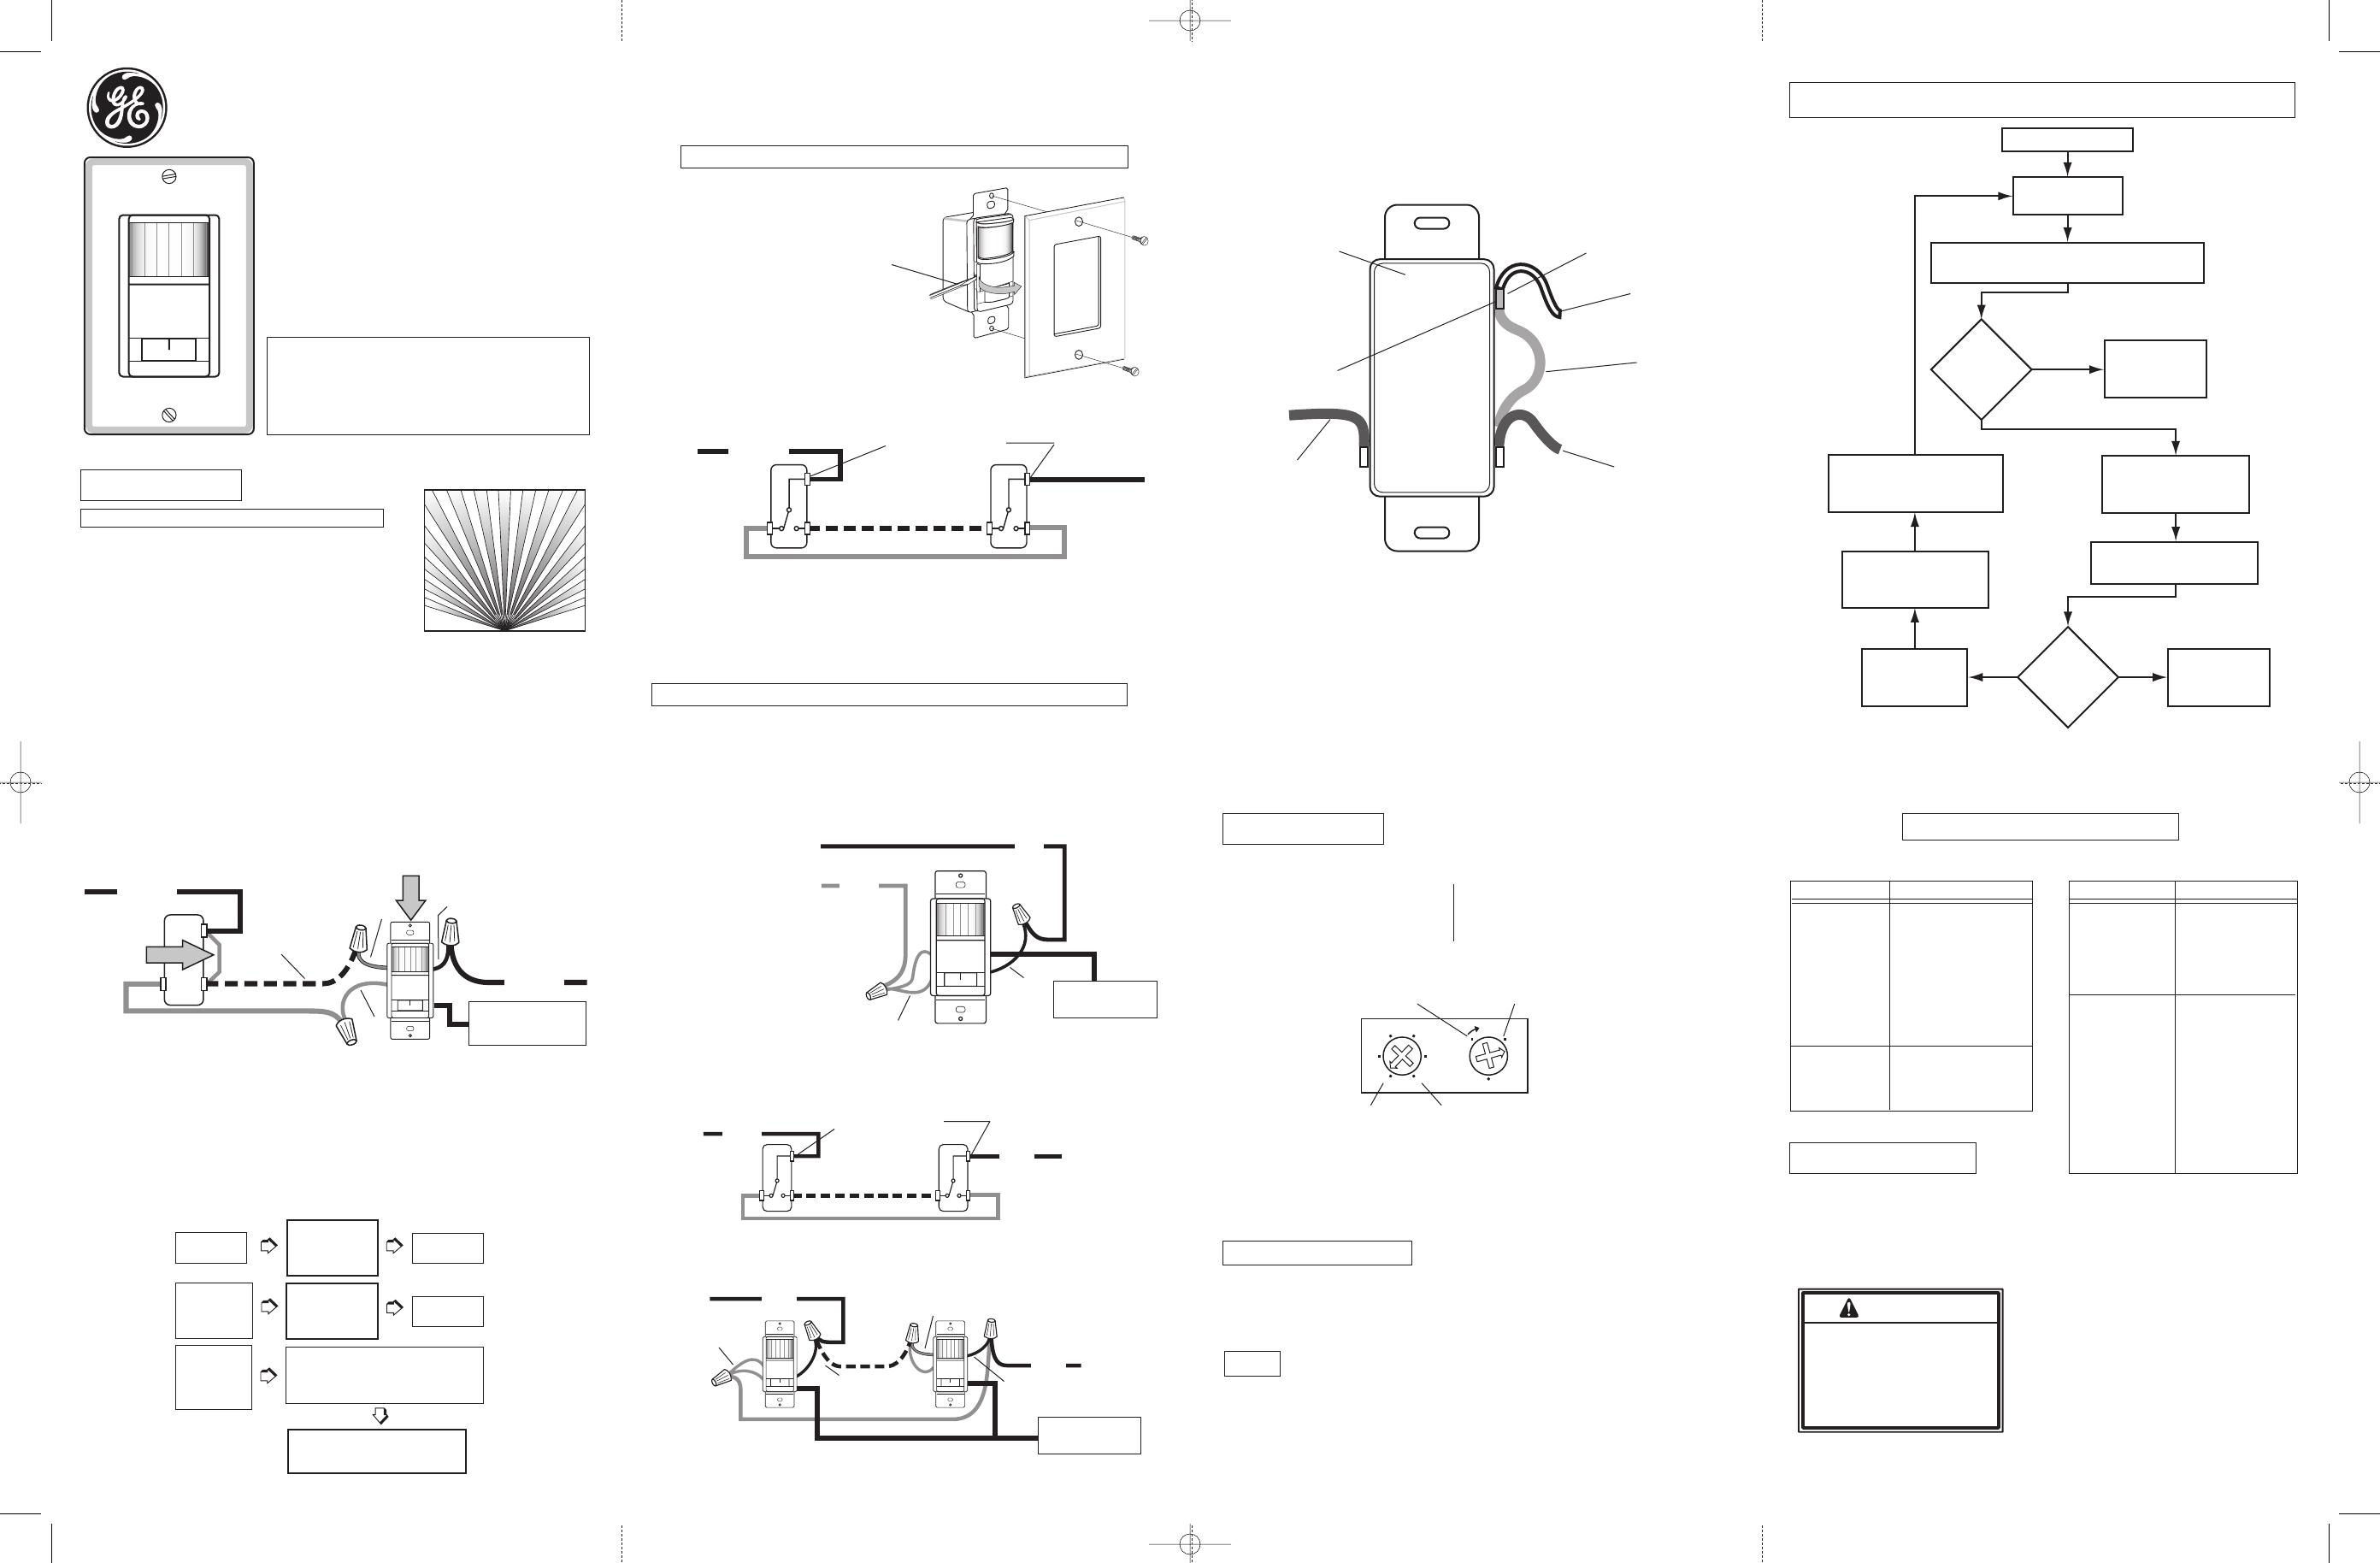 Heath Zenith Motion Detector Wiring Diagram | Wiring Diagram - Heath Zenith Motion Sensor Light Wiring Diagram